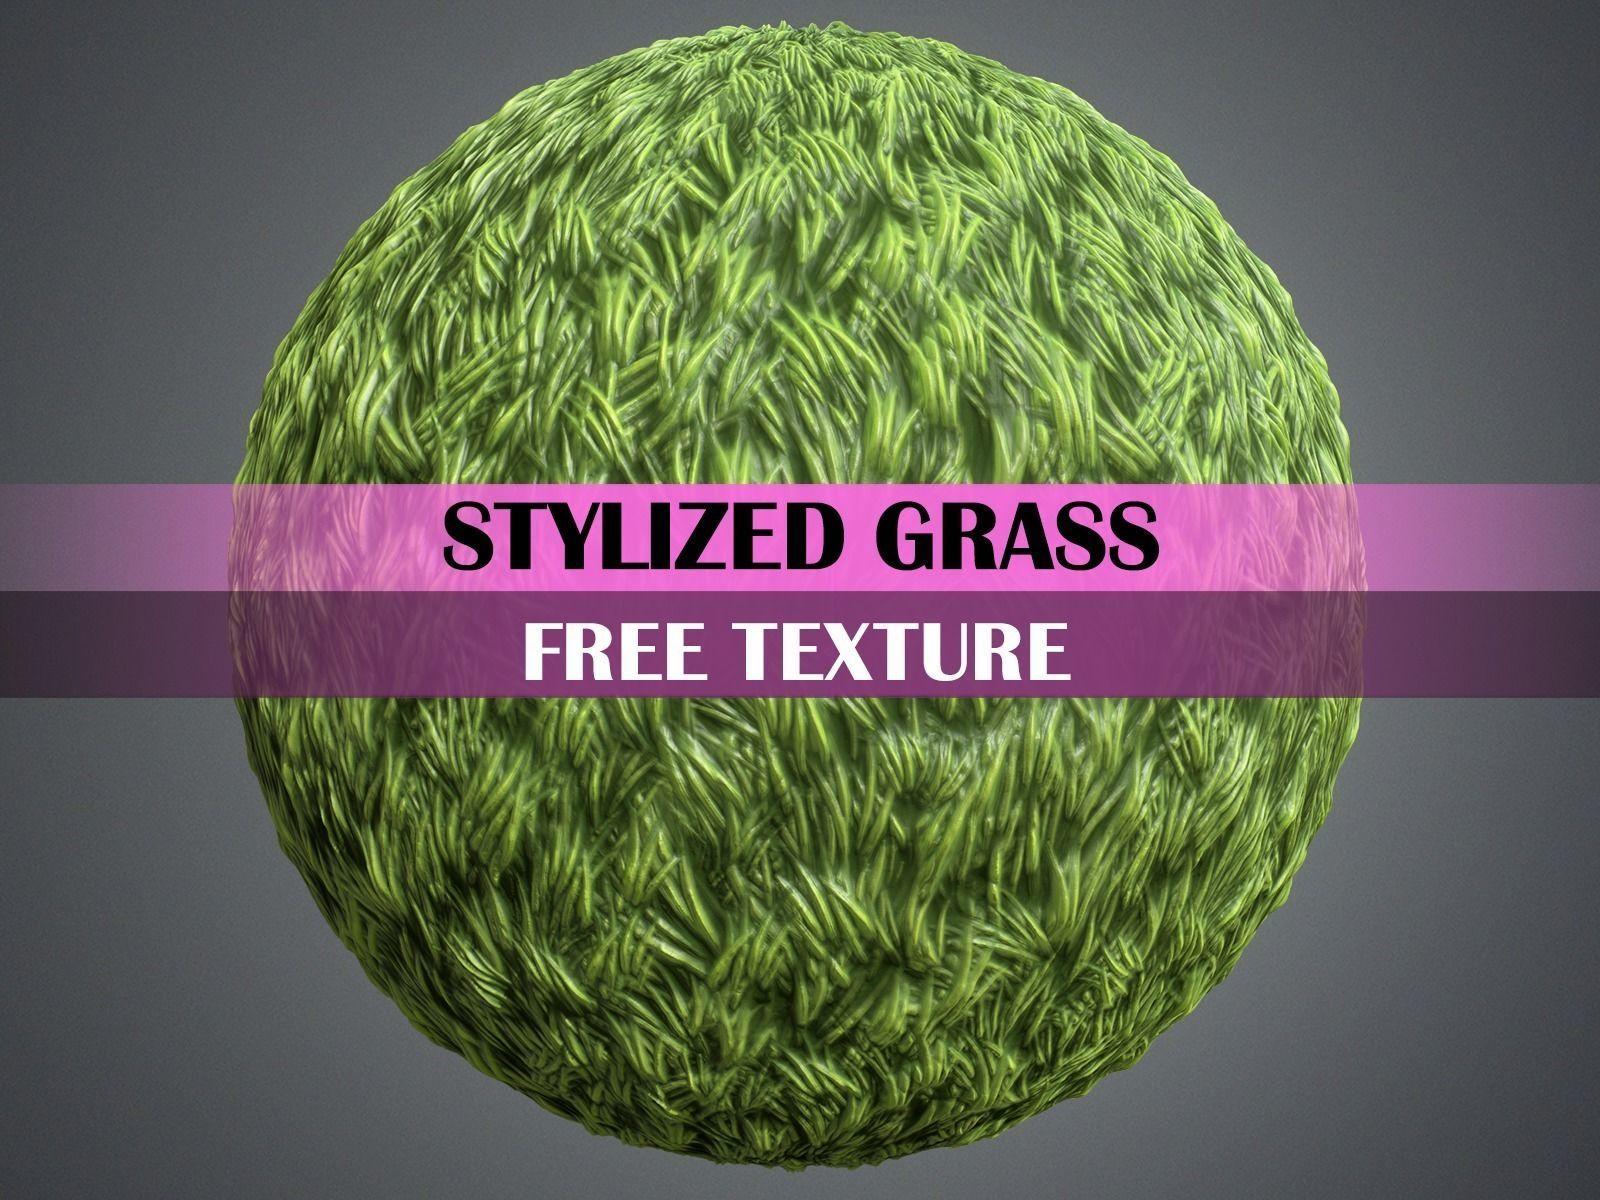 Stylized Grass Texture Free